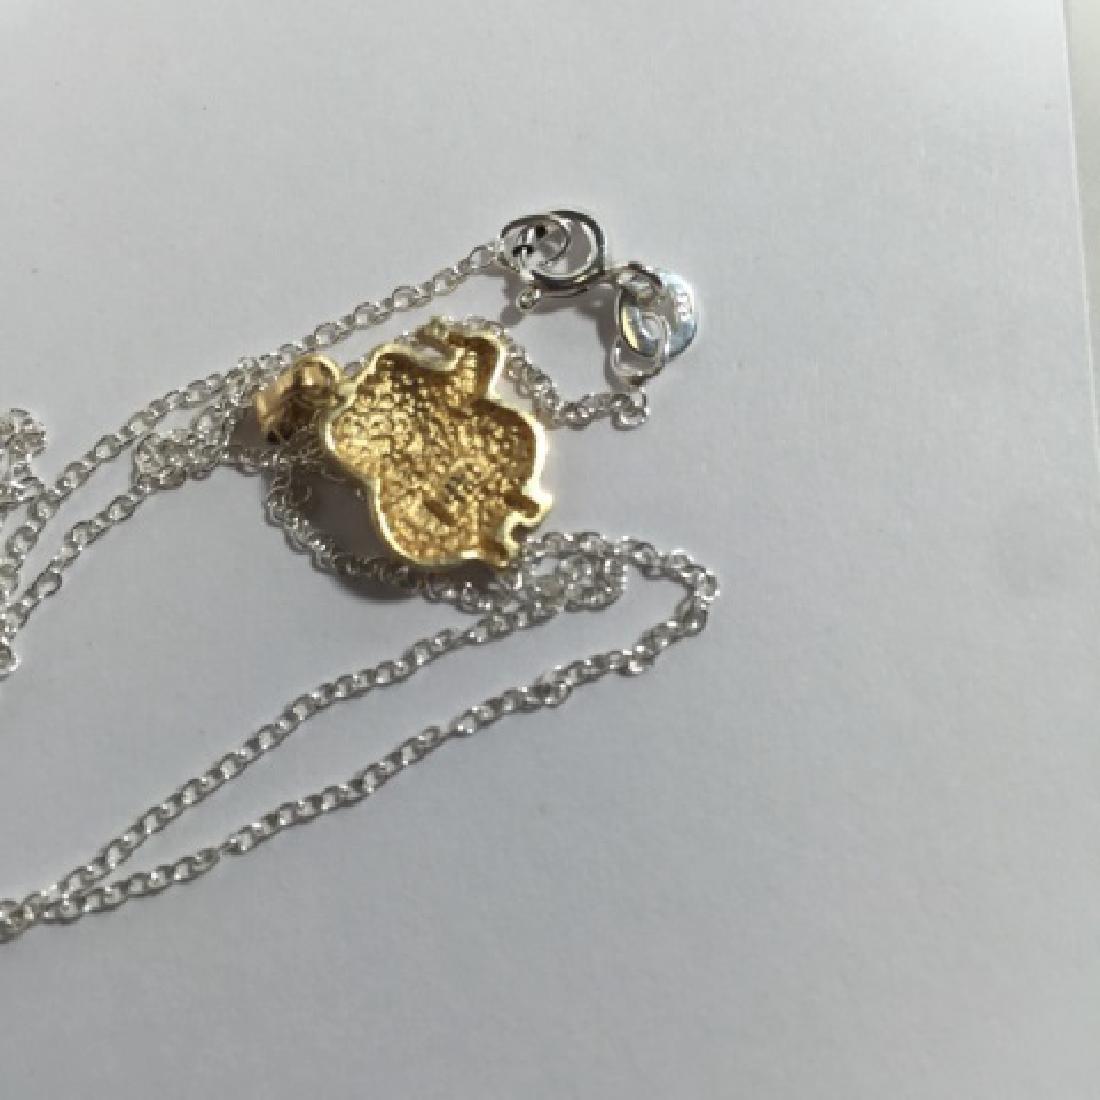 14kt Gold & Diamond Elephant Necklace Pendant - 4